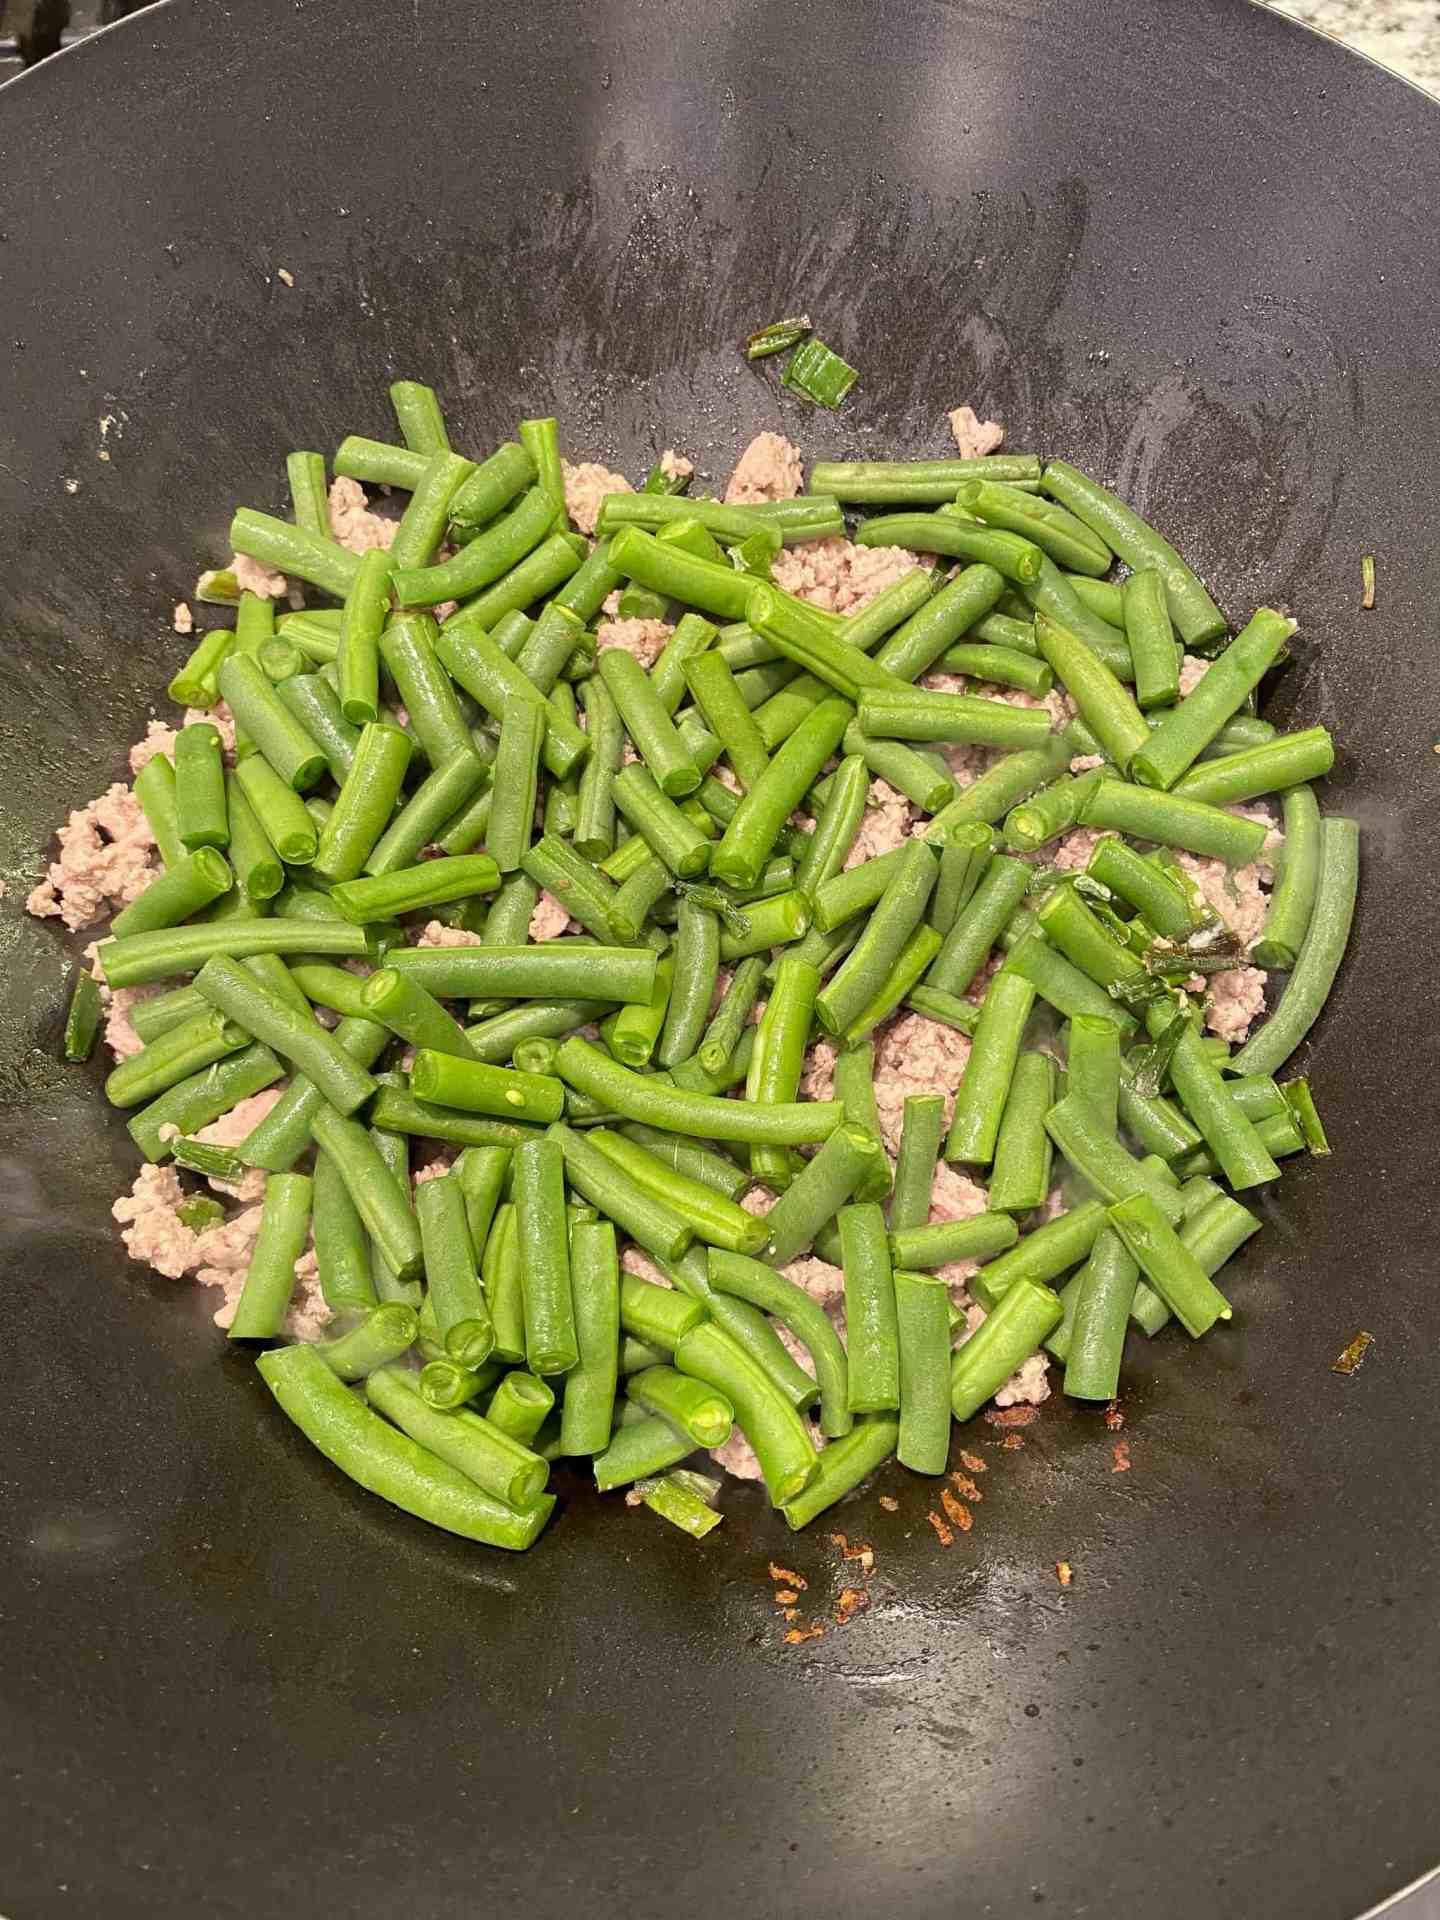 add-green-beans-to-stir-fry